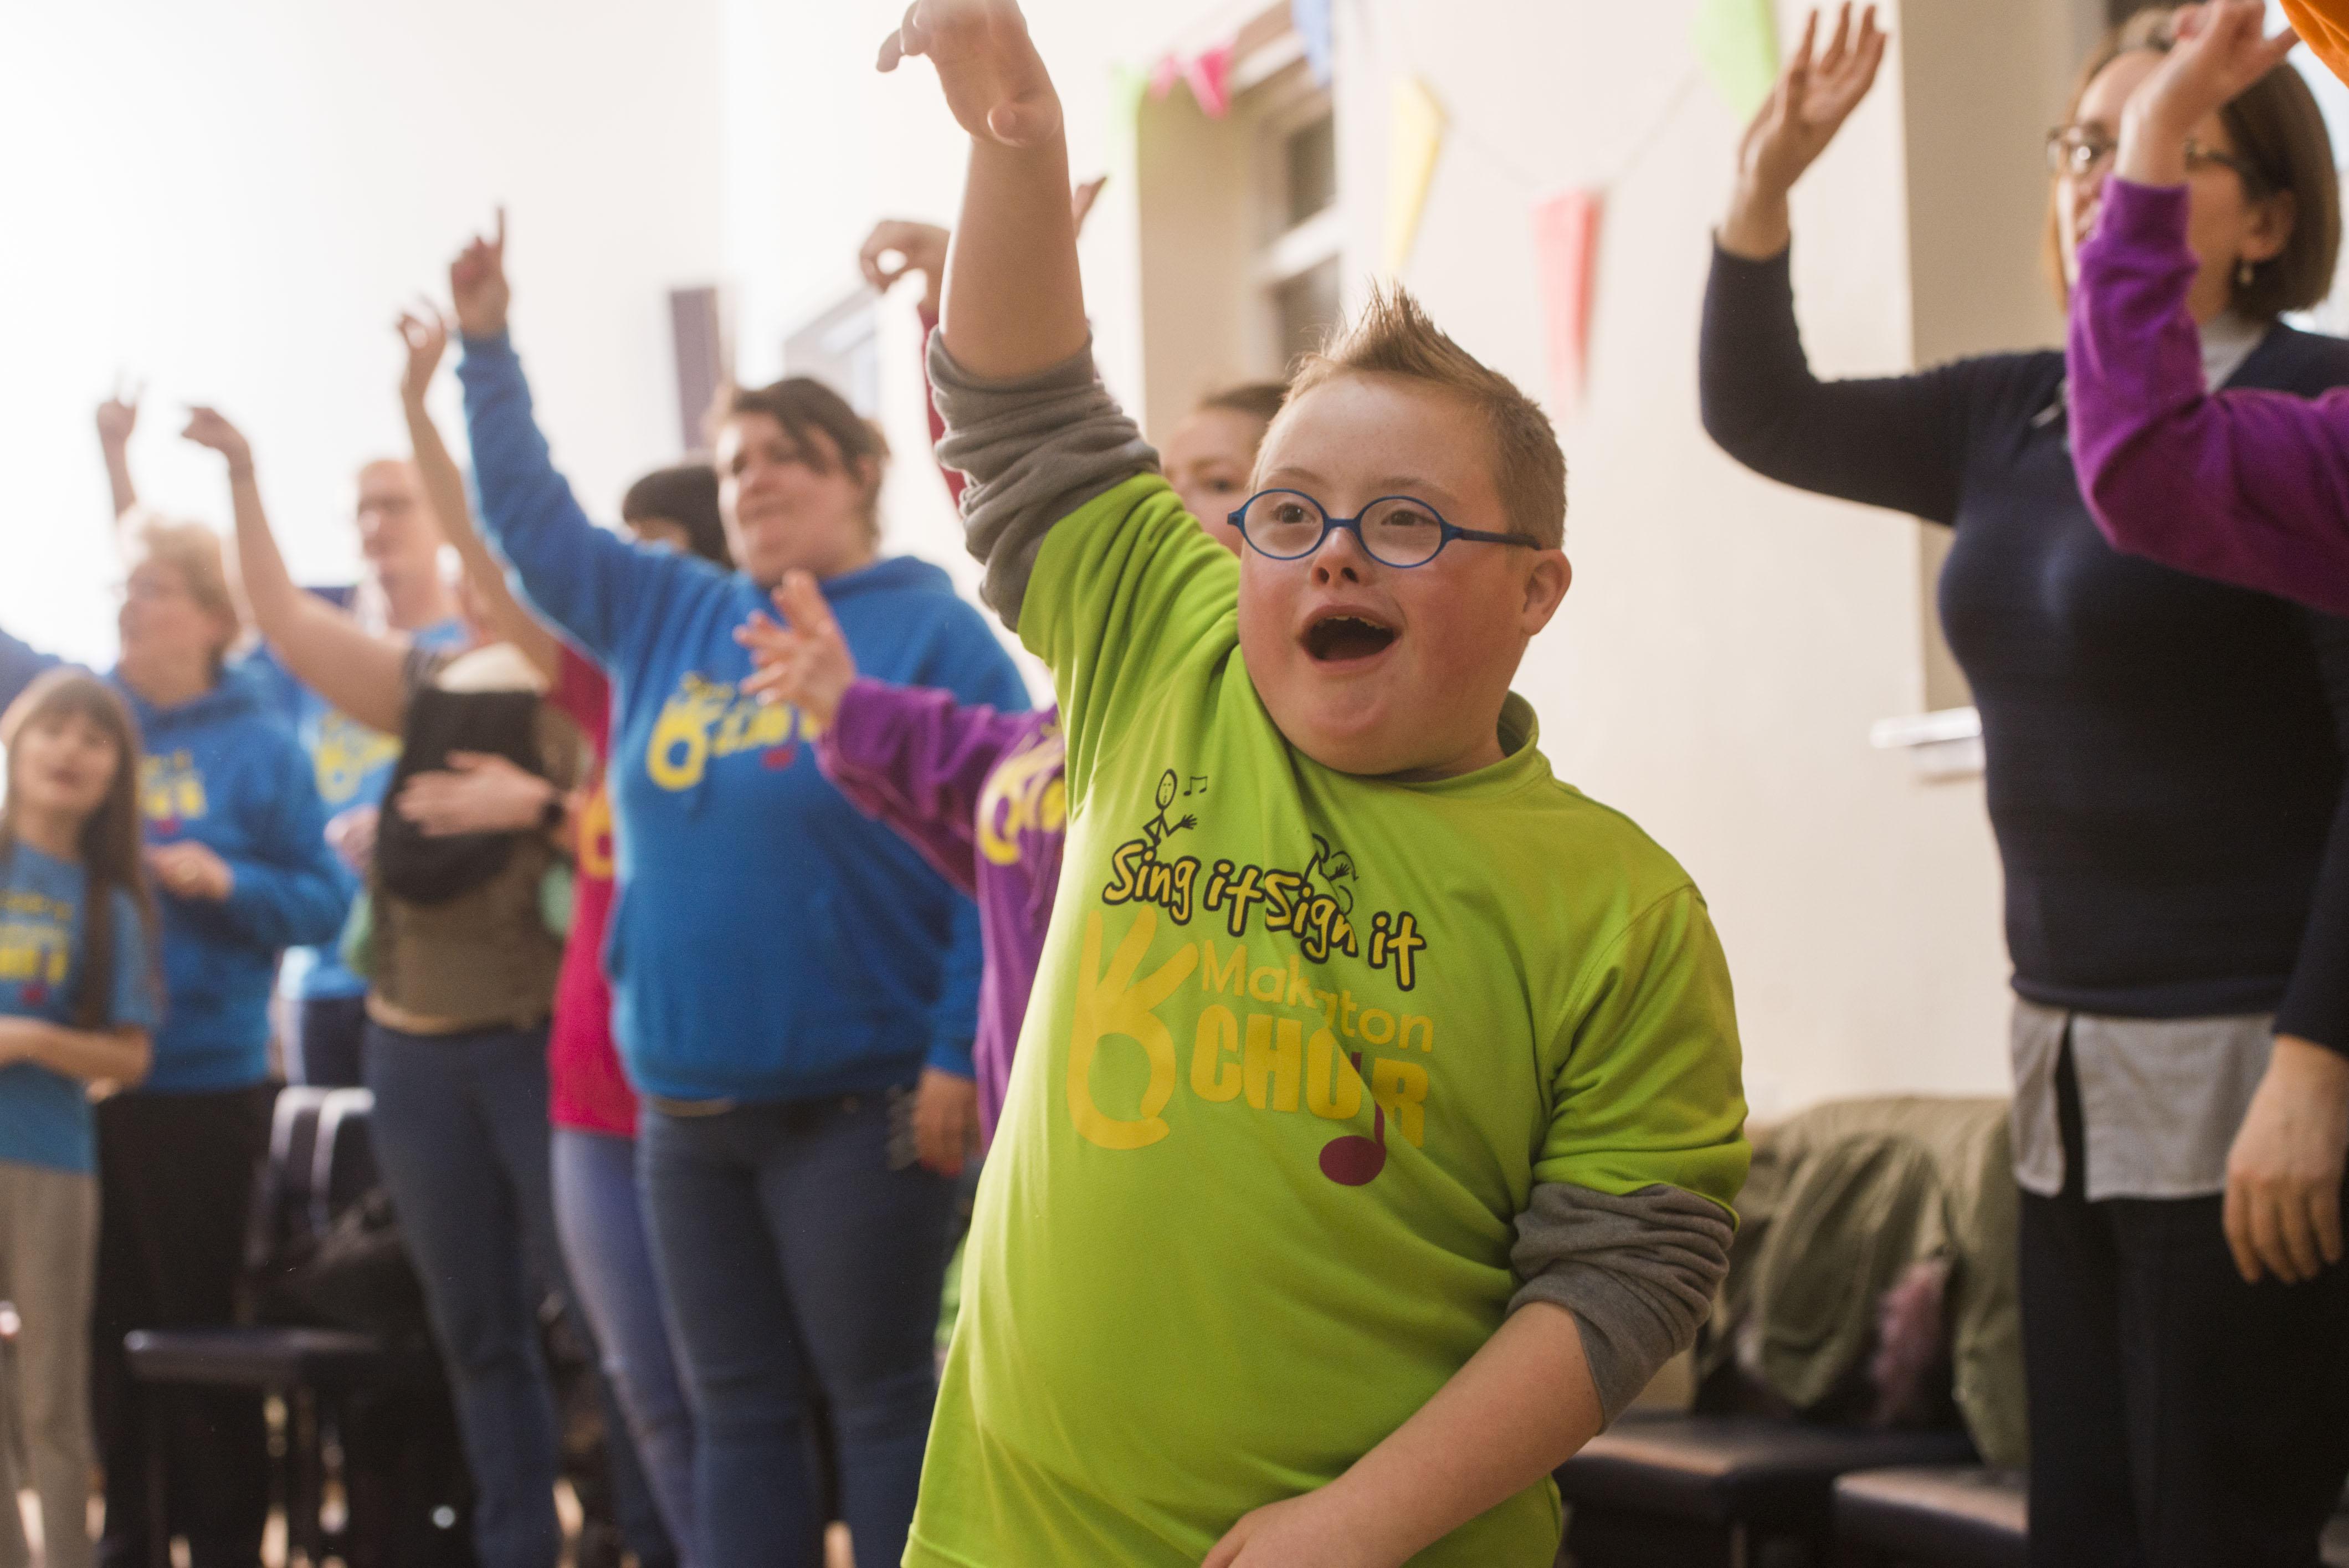 Ben Baxter,10, at the choir practice.